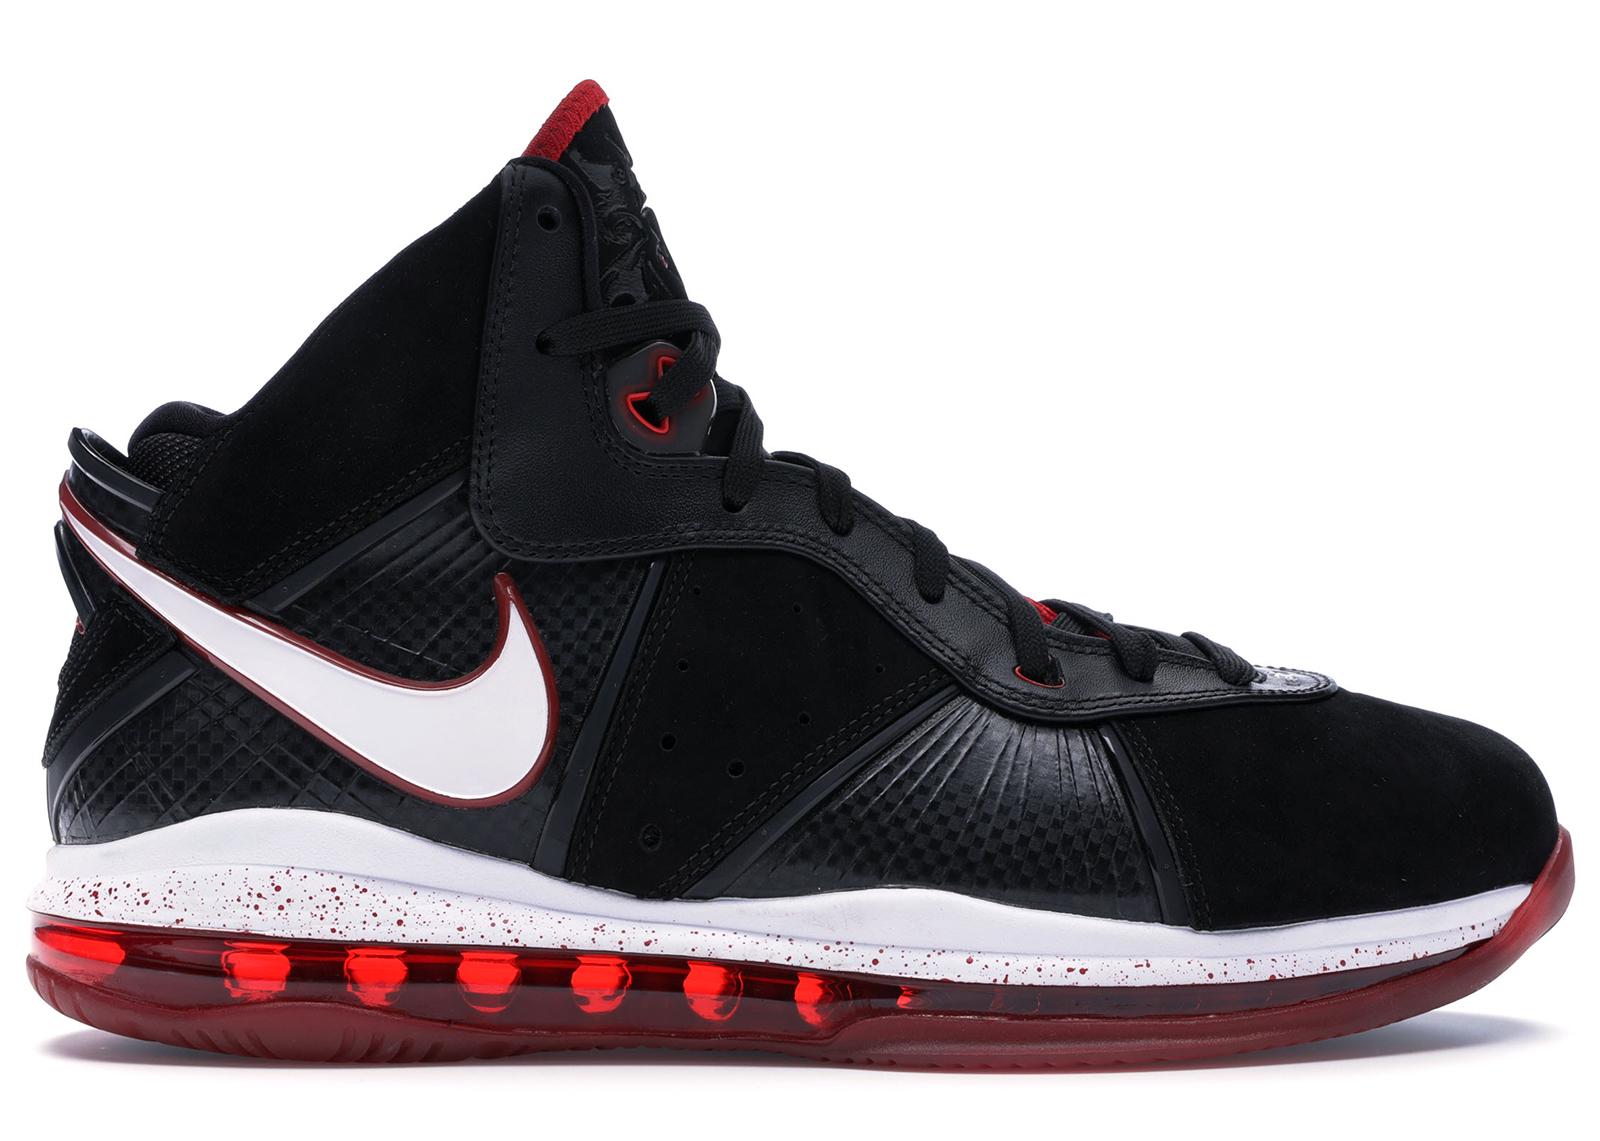 Buy Nike LeBron 8 Shoes \u0026 Deadstock